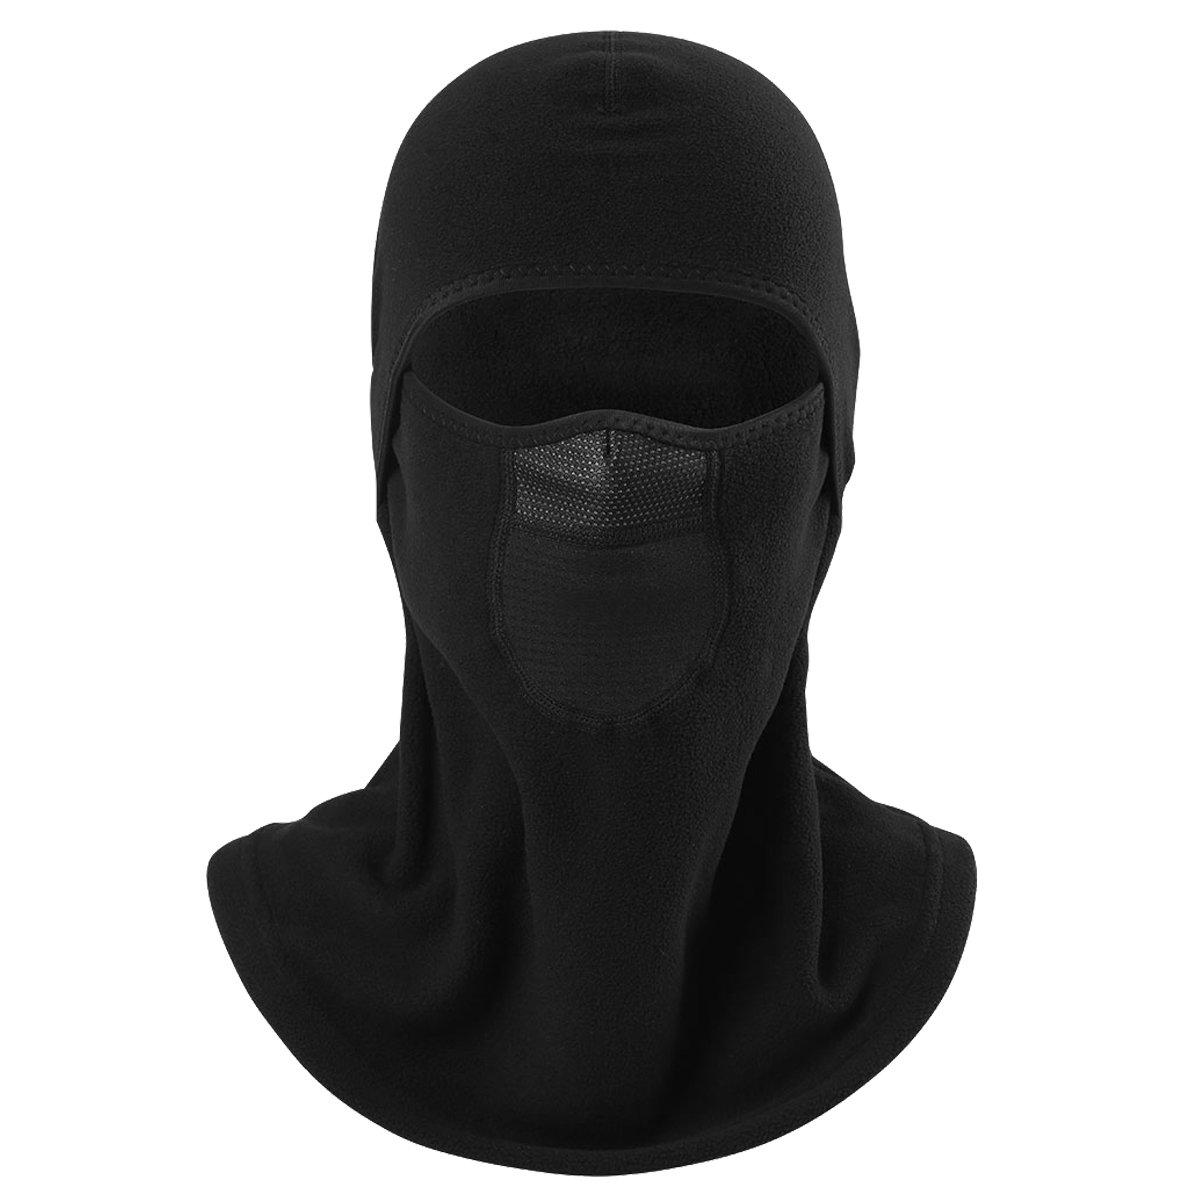 ECYC Outdoor Black Balaclava Mask Winter Waterproof Fleece Thermal Neck Warmer Full Face Masks Tactical Mask